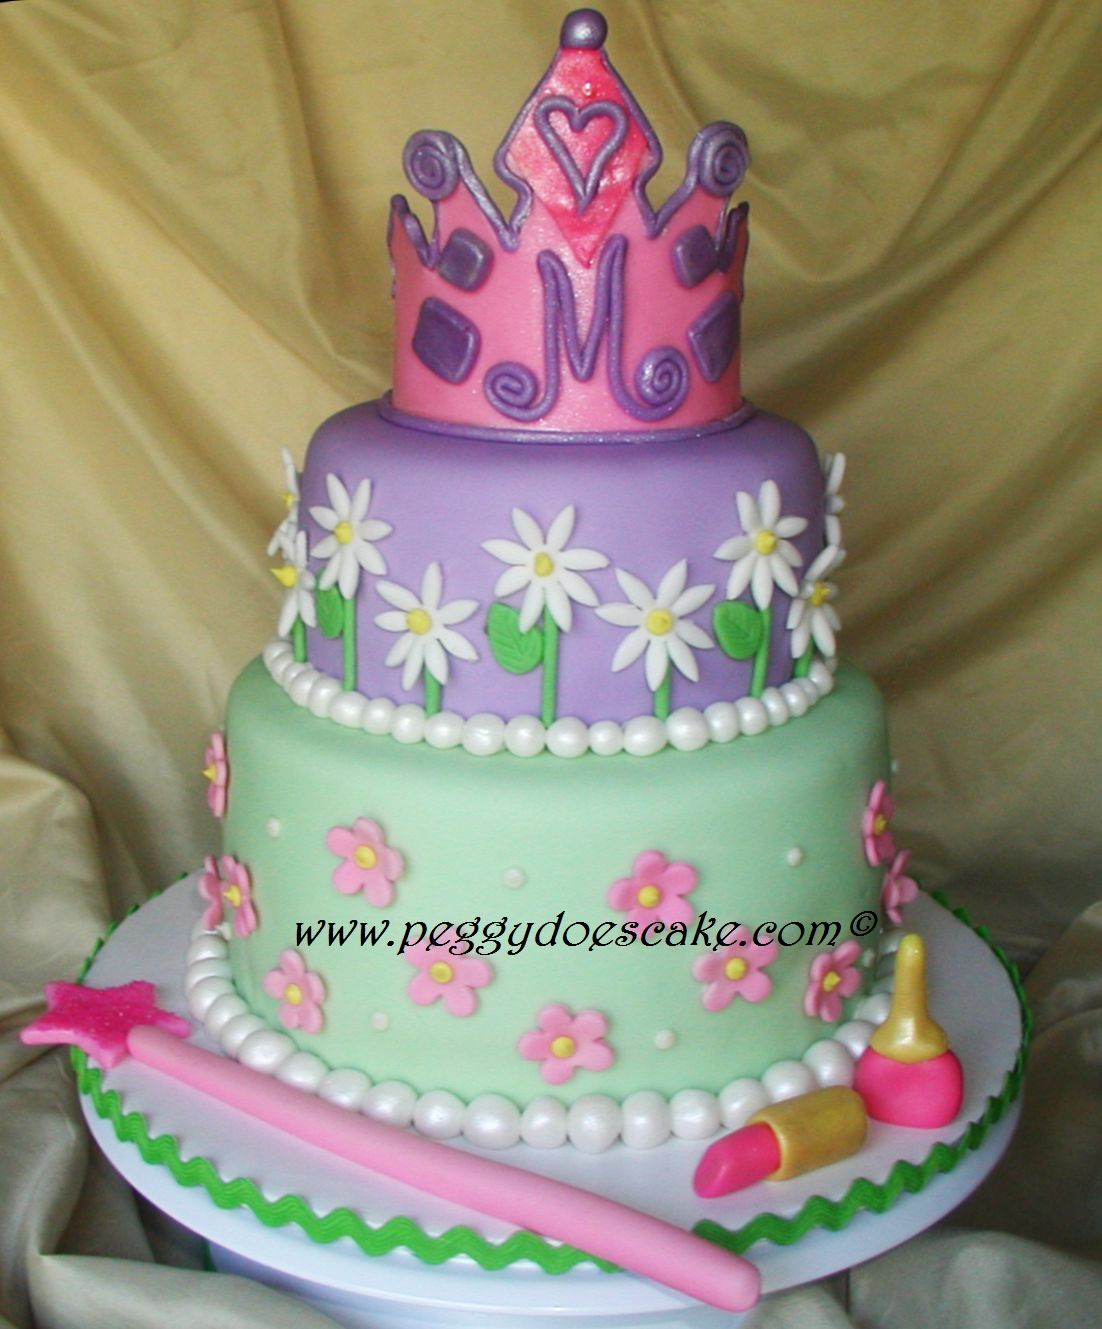 Peggy Does Cake.: Meg's Princess Cake For Her Birthday Tea